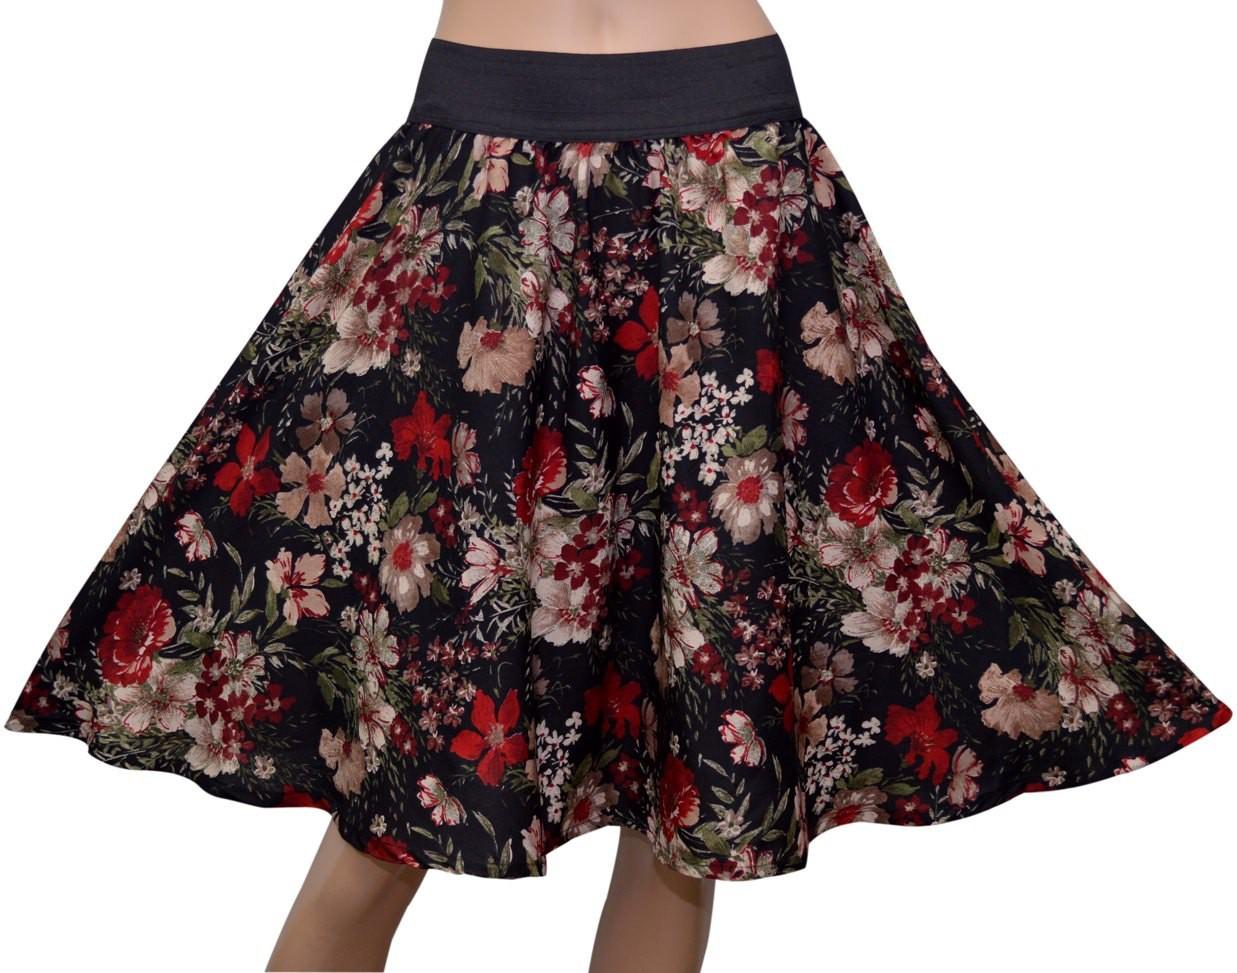 GraceDiva Floral Print Womens Gathered Black Skirt